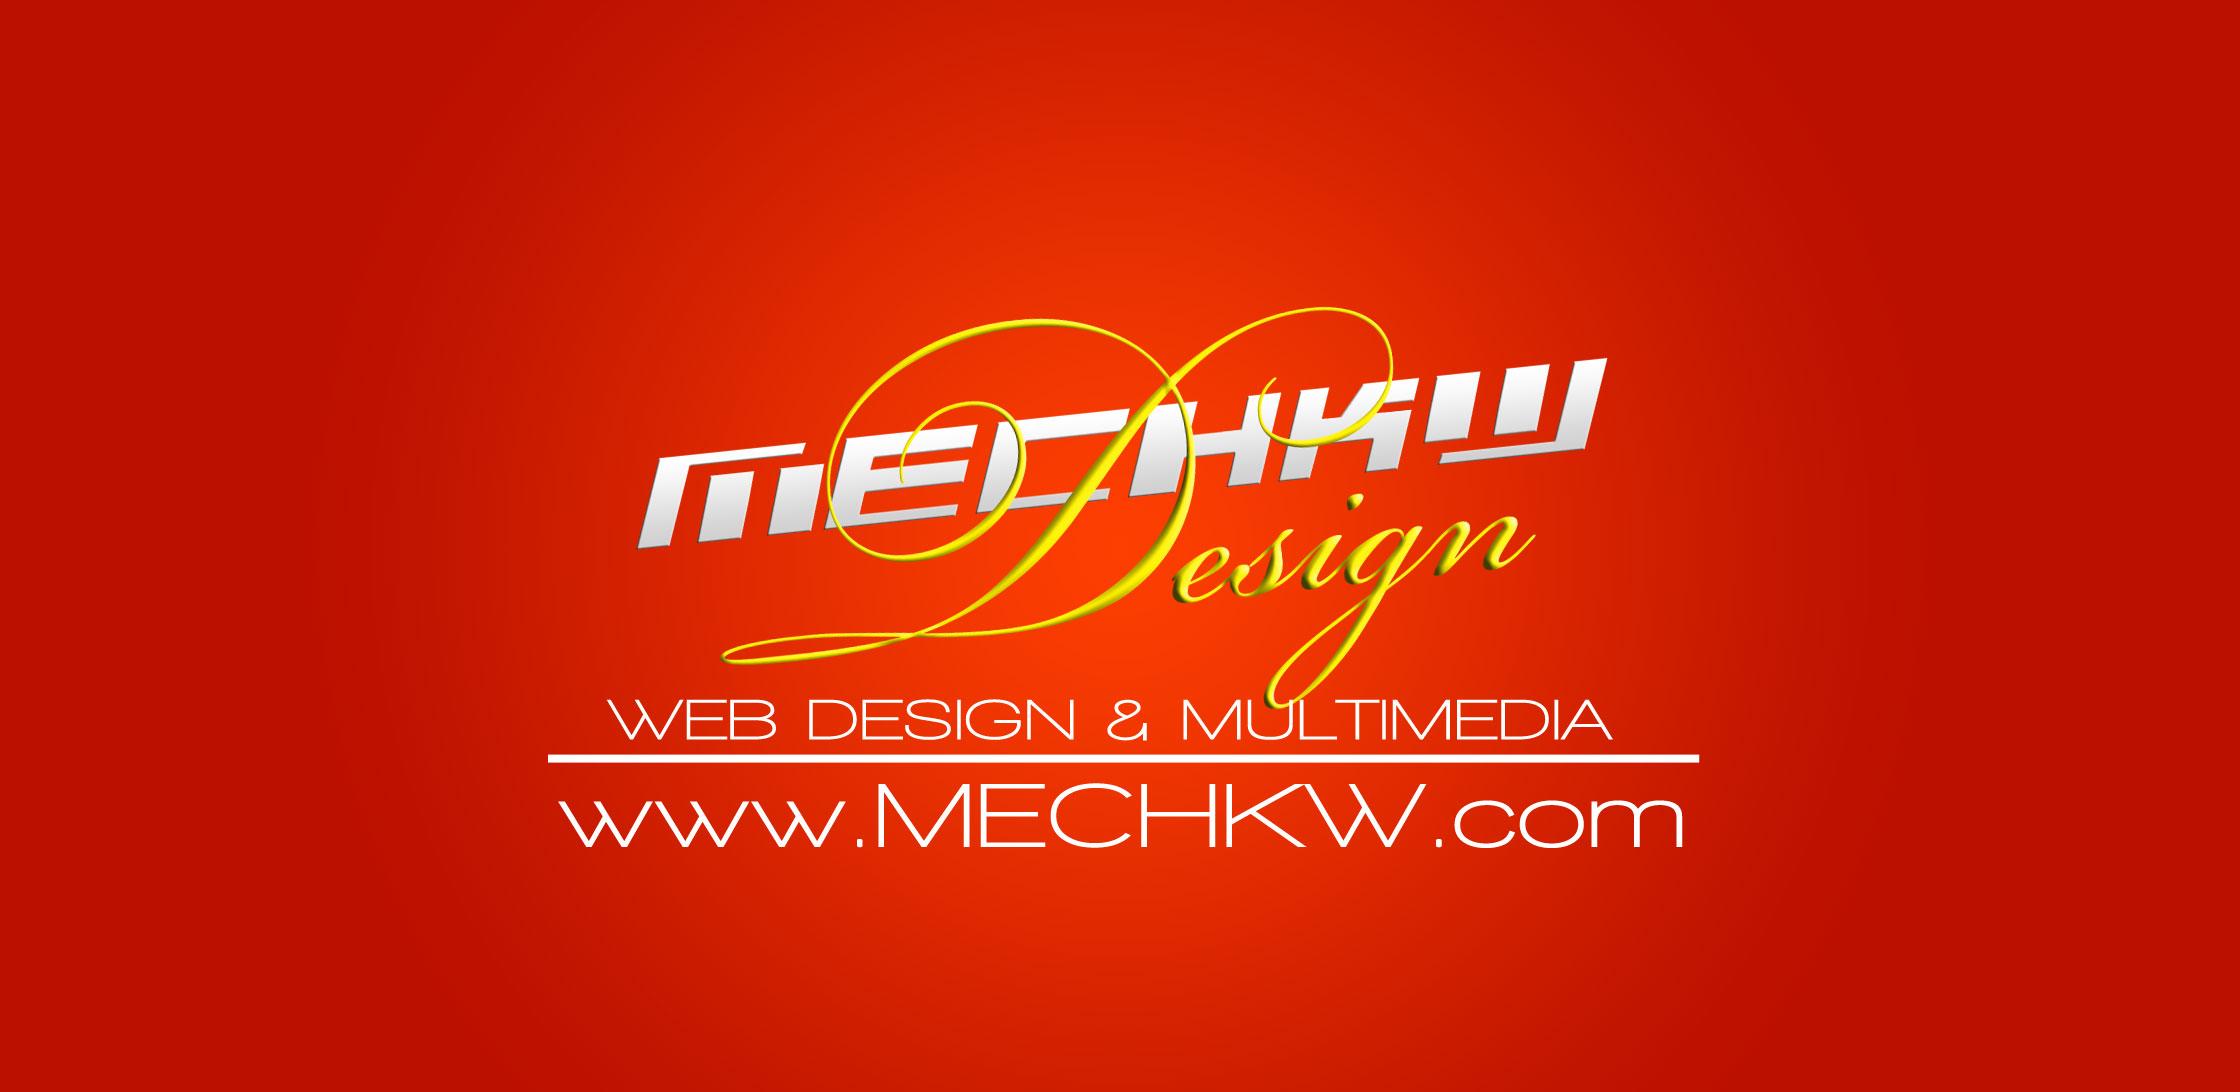 MechKW Design